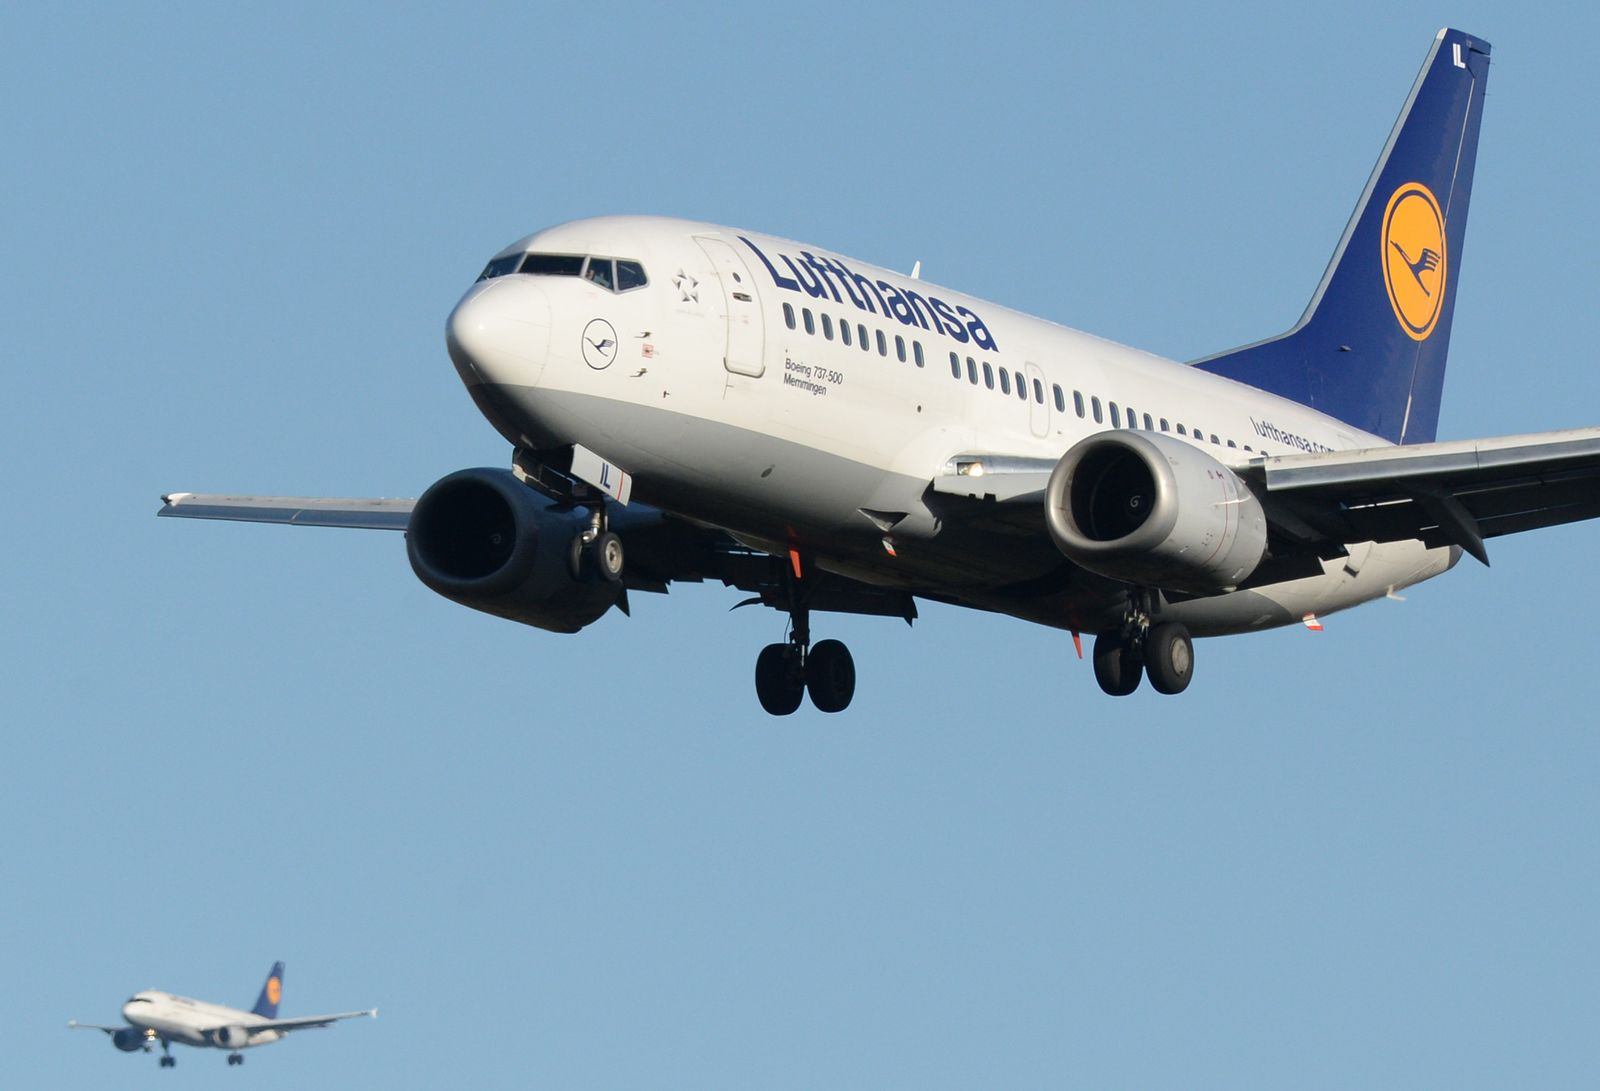 Flughafen Frankfurt am Main Lufthansa